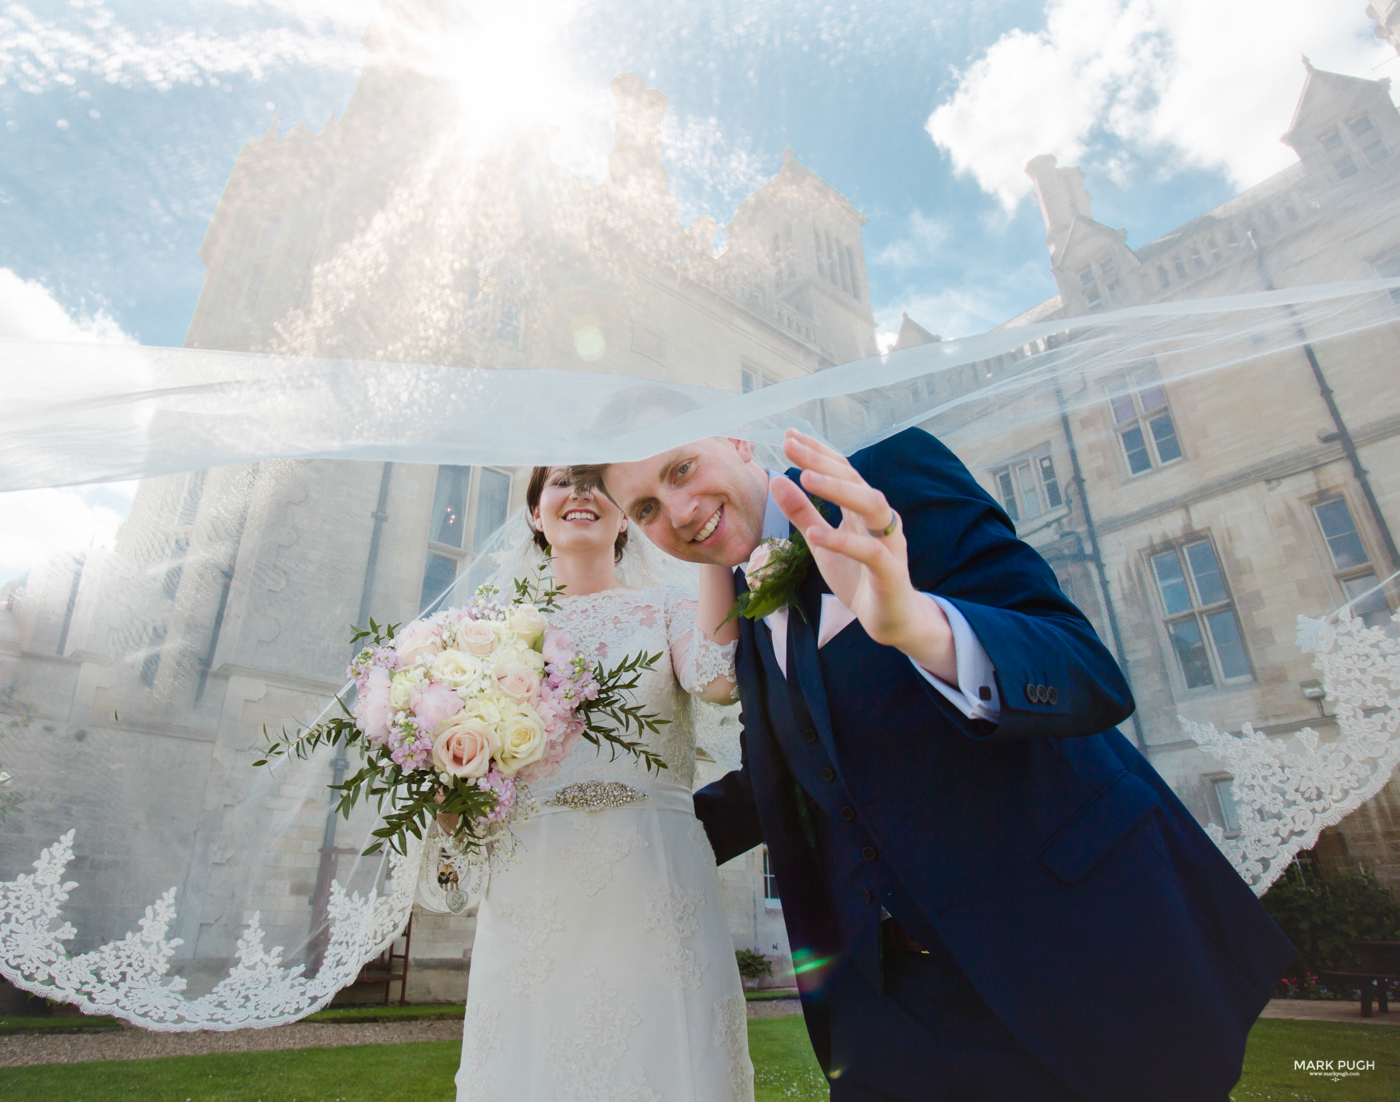 098 Wedding Photography Award winning Wedding Photographer and Videographer Mark Pugh www.markpugh.com.JPG